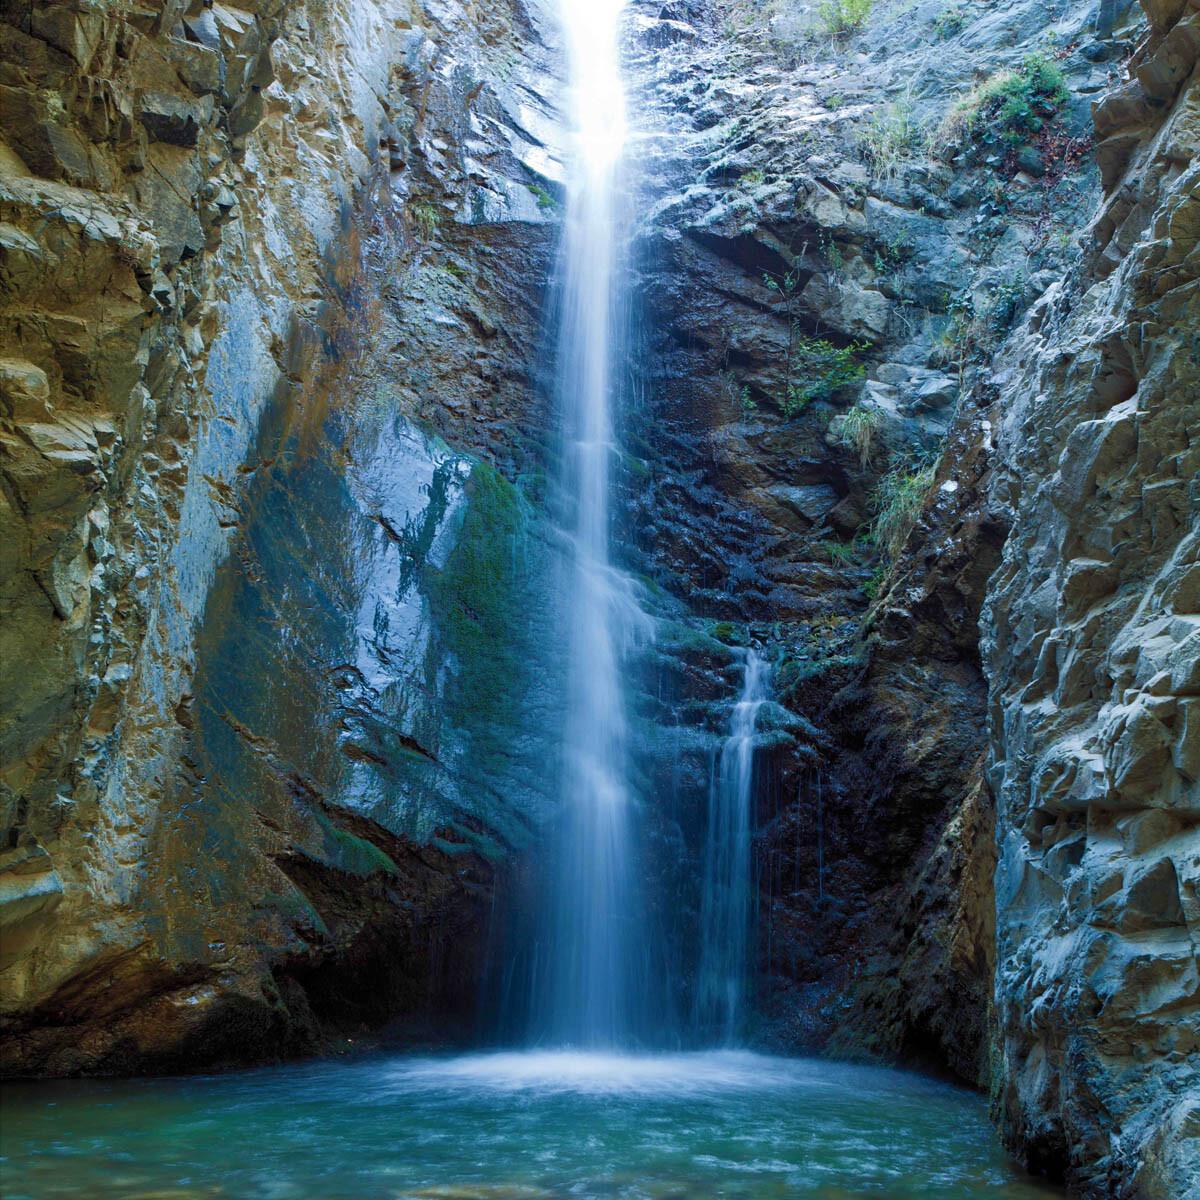 PlateART Duschrückwand mit Motiv Wasserfall